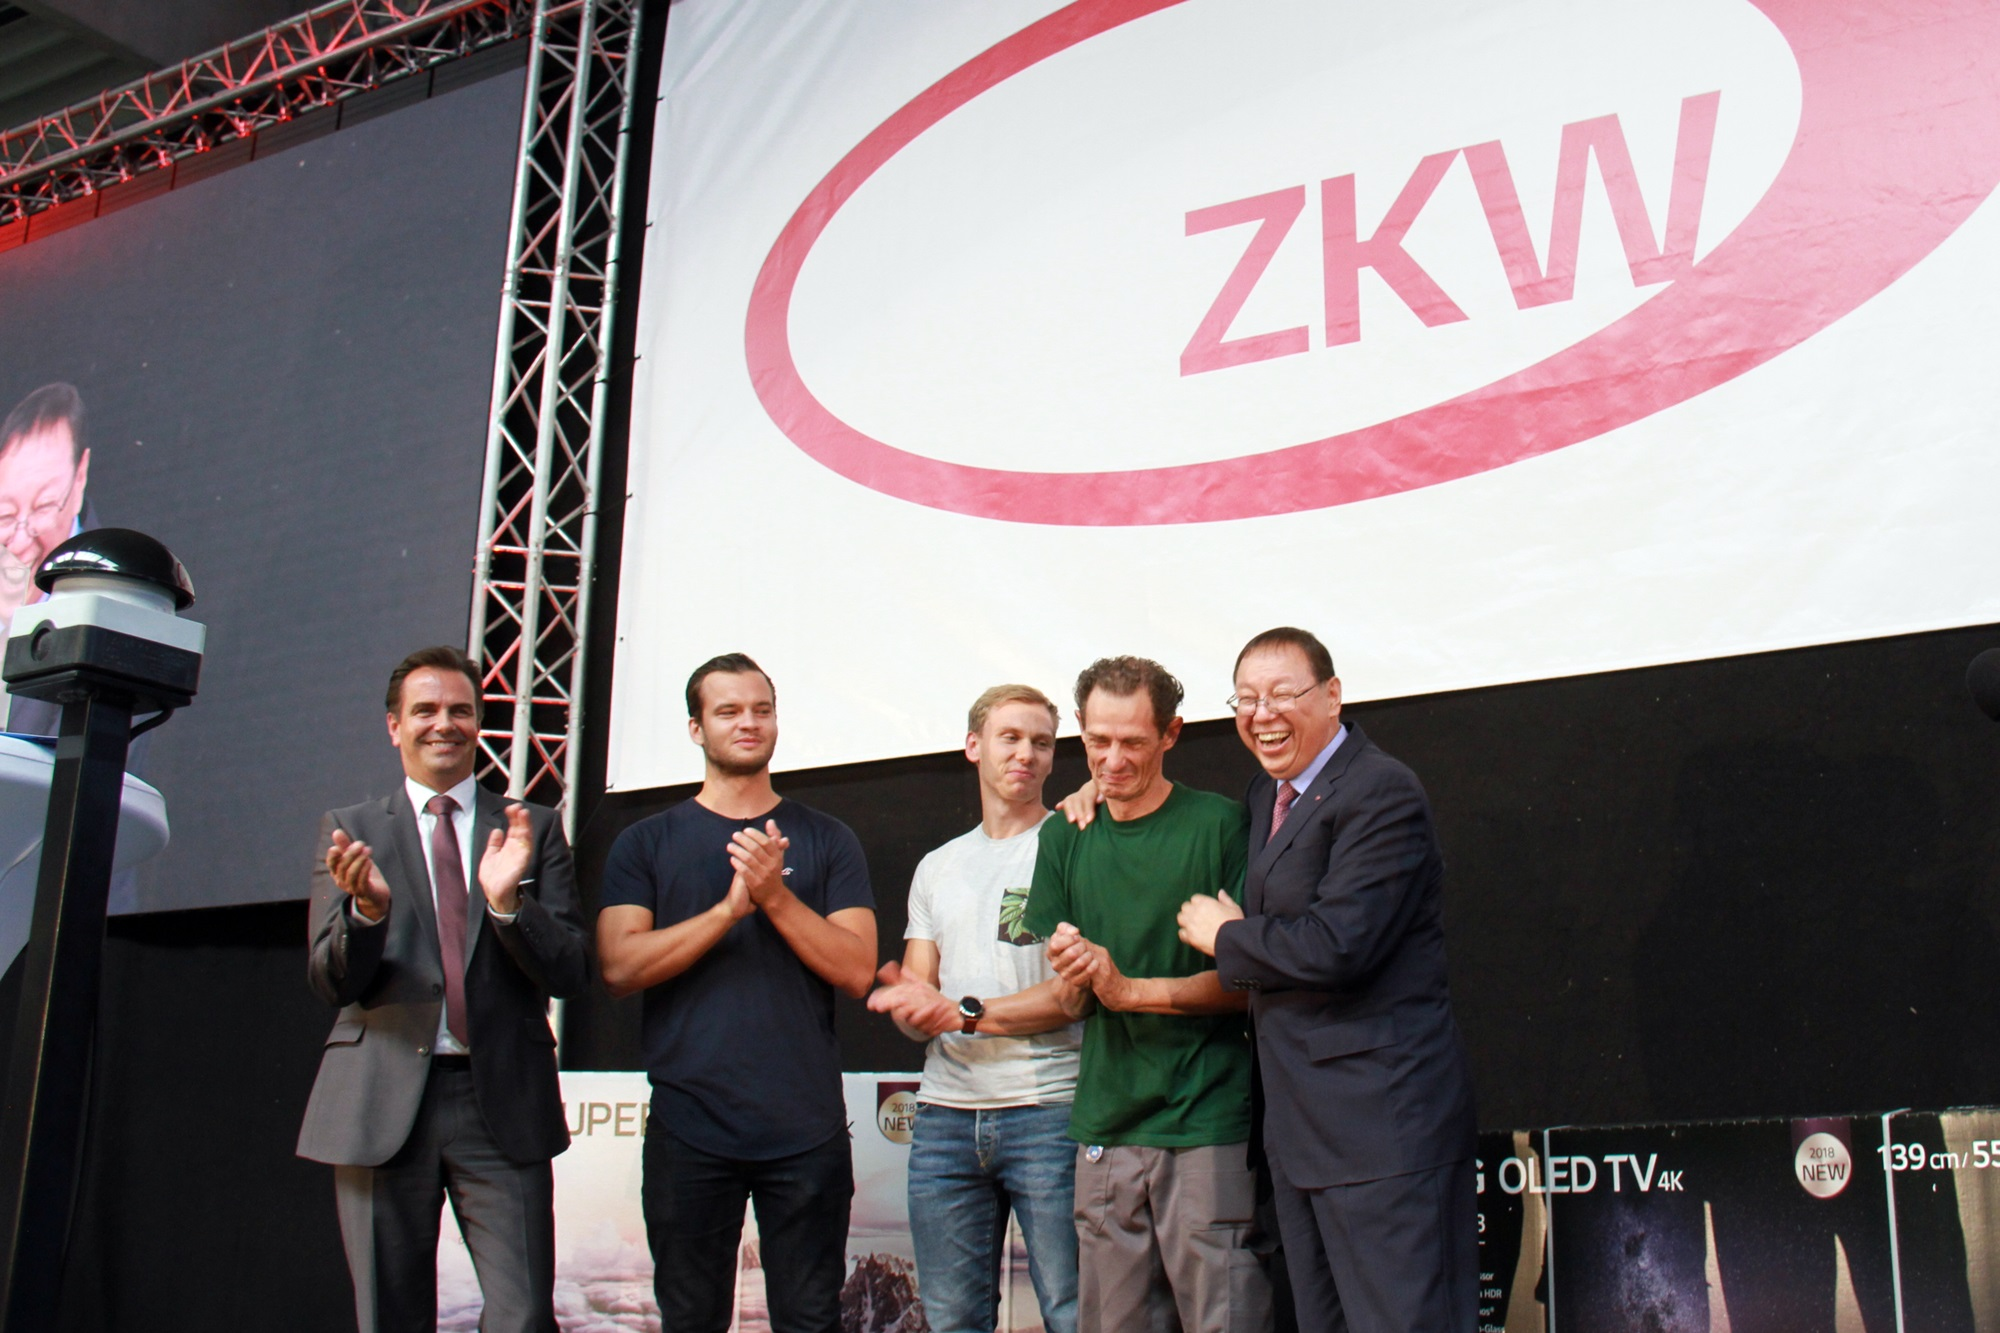 "LG전자 CEO 조성진 부회장이 오스트리아 비젤버그(Wieselburg)에 위치한 ZKW 본사를 방문해 현지 임직원들을 격려하고 있다. 현지 임직원 2,000여 명이 참석한 이 자리에서 조 부회장은 ""ZKW는 위대한 여정의 주축이 될 것""이라며 ""비젤버그는 이 여정의 가장 중요한 거점""이라고 강조했다"